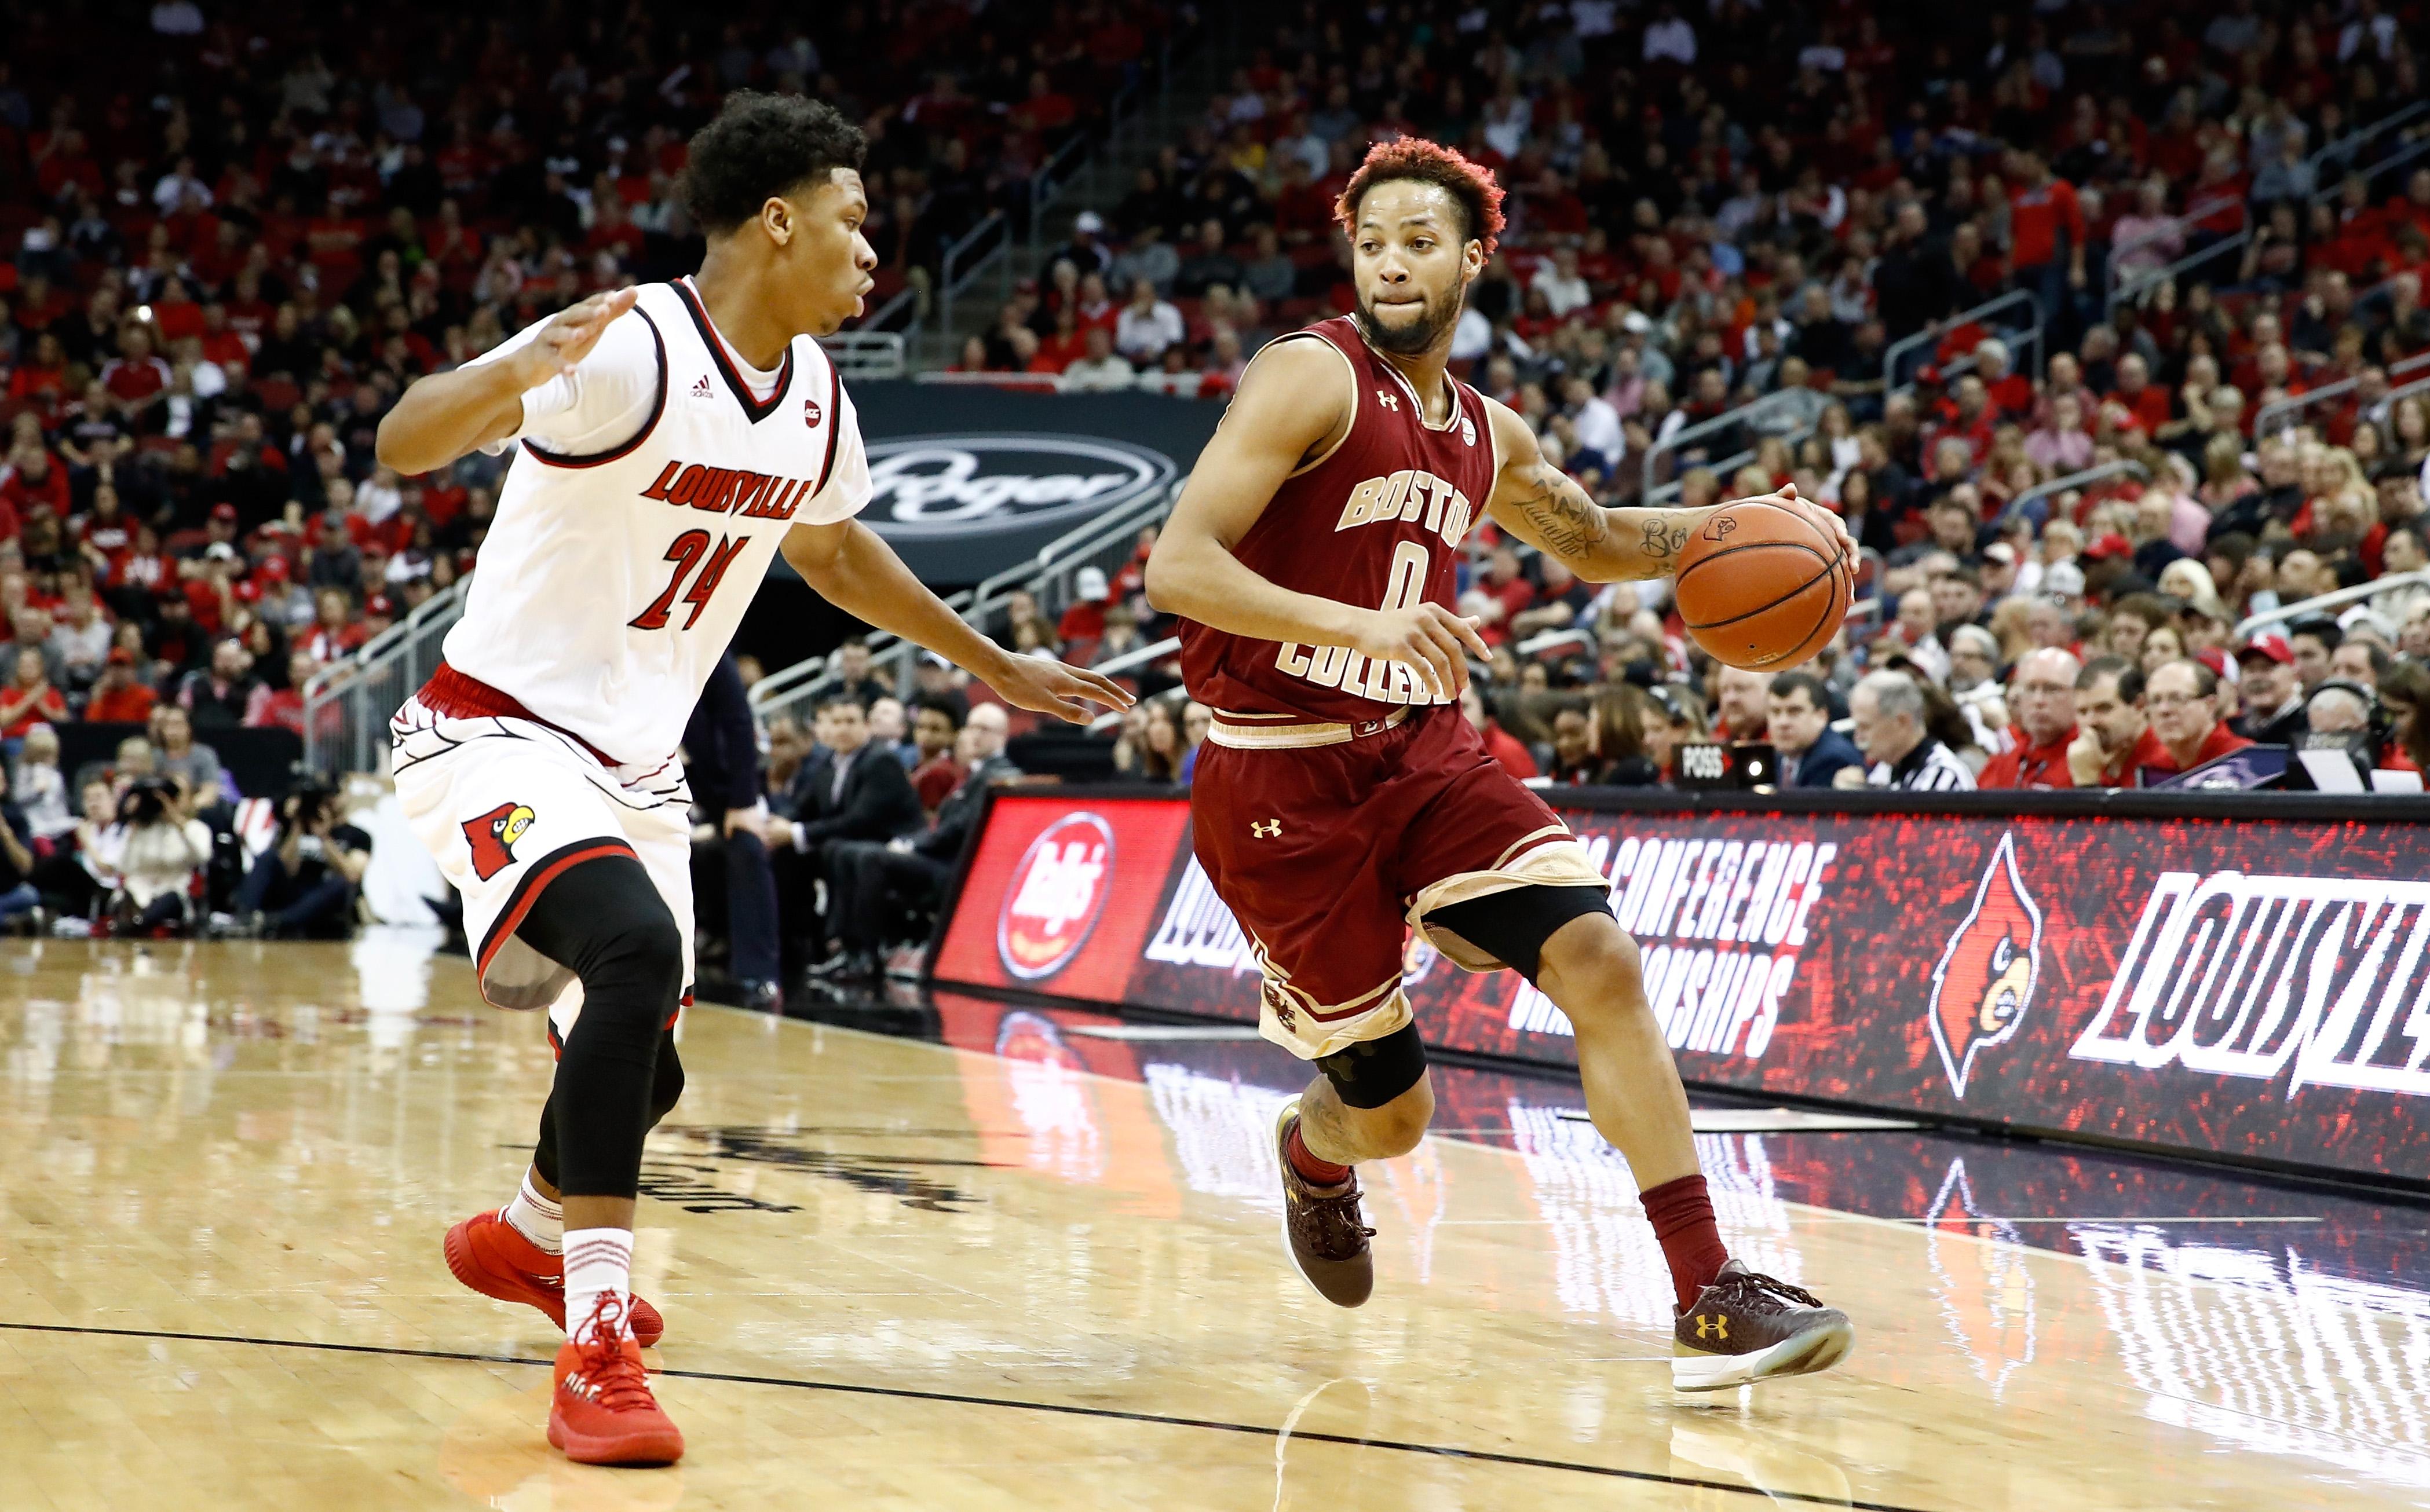 boston college men's basketball - bc interruption